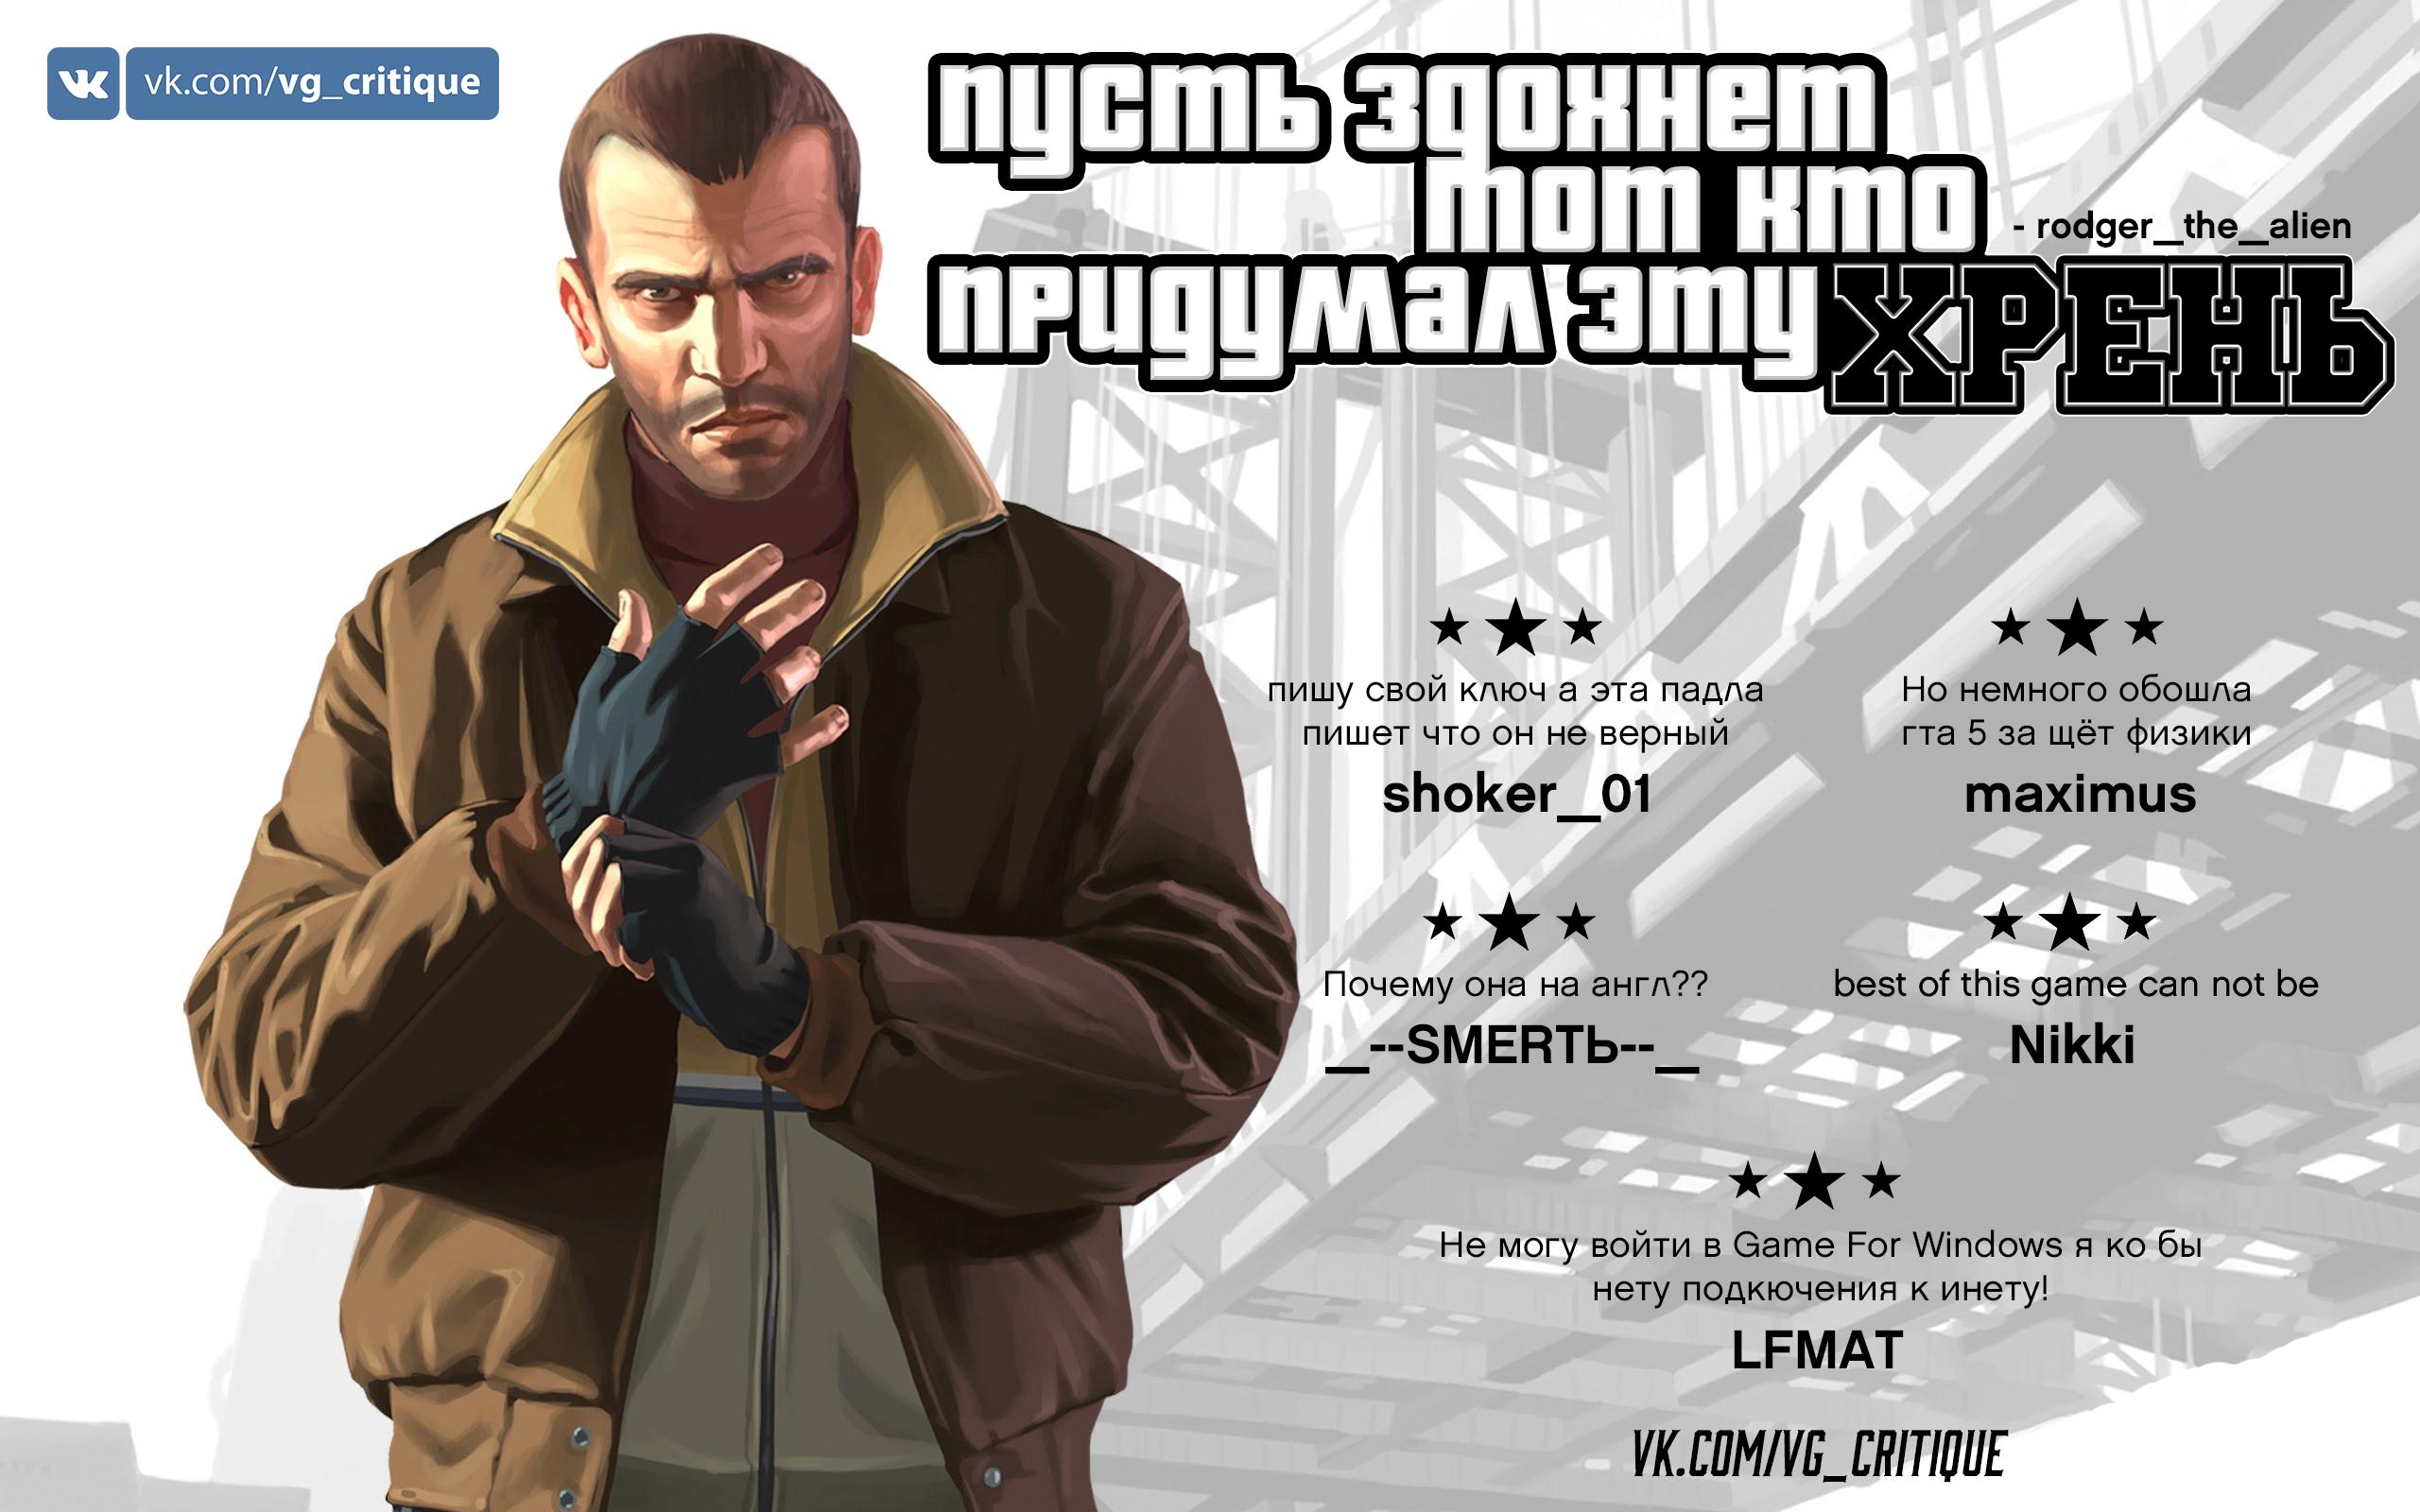 Grand Theft Auto IV. Критика XXI века - Изображение 1